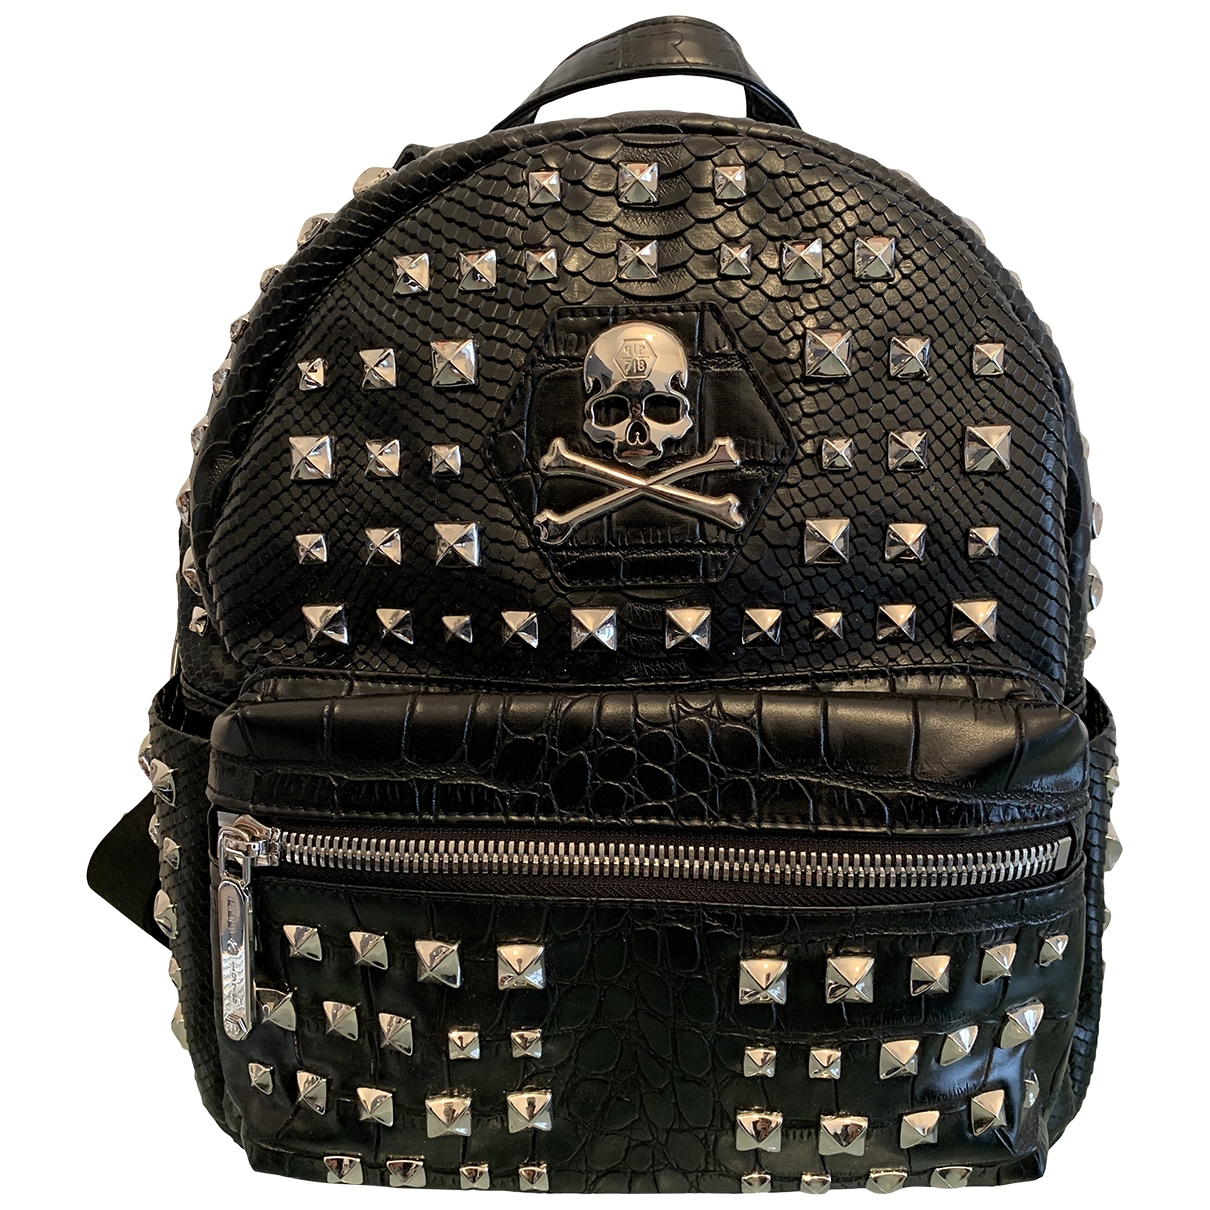 Philipp Plein \N Black Leather bag for Men \N